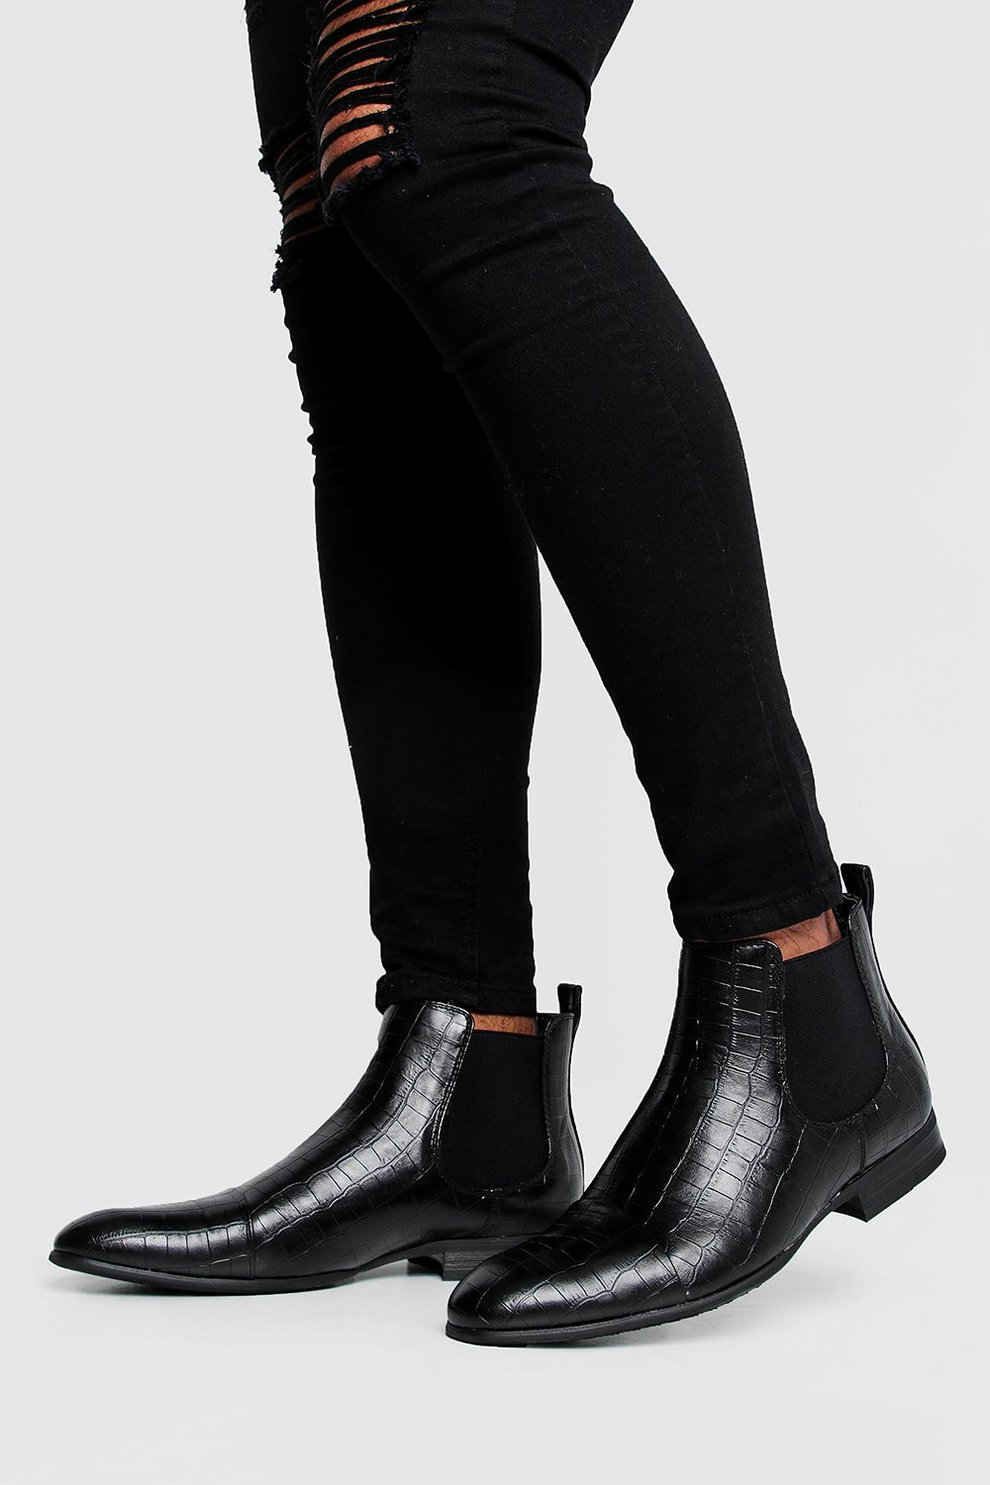 Croc Leather Look Chelsea Boots | Boohoo